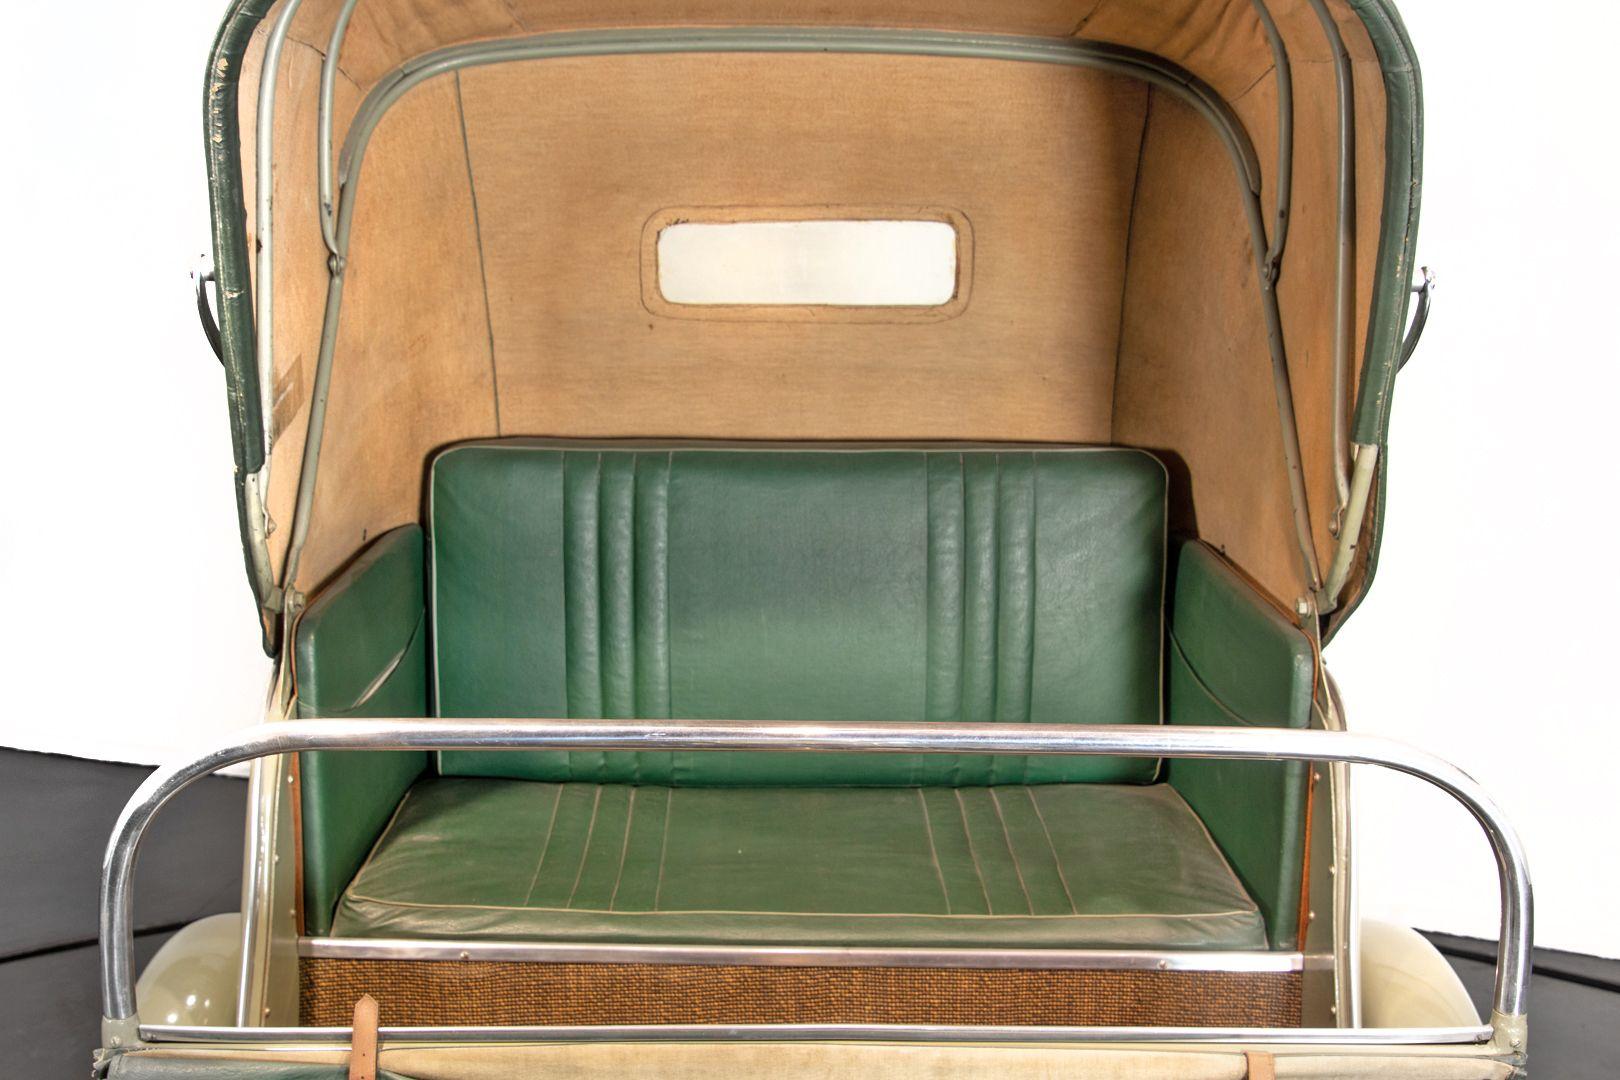 1956 Benelli 125 Leoncino Rikshaws 74342